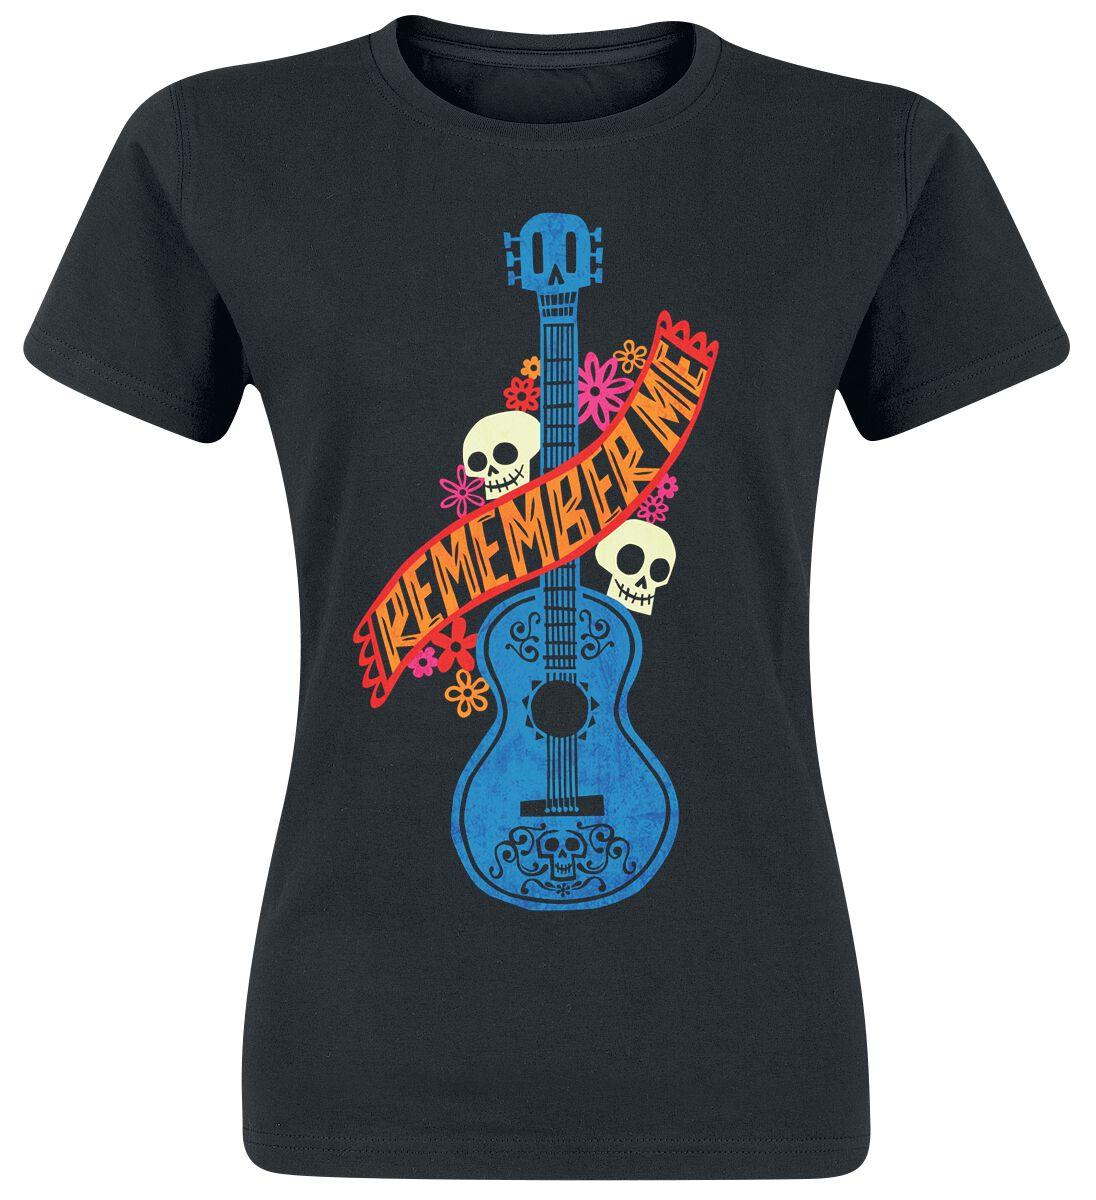 Merch dla Fanów - Koszulki - Koszulka damska Coco Guitarra Azul Koszulka damska czarny - 371280